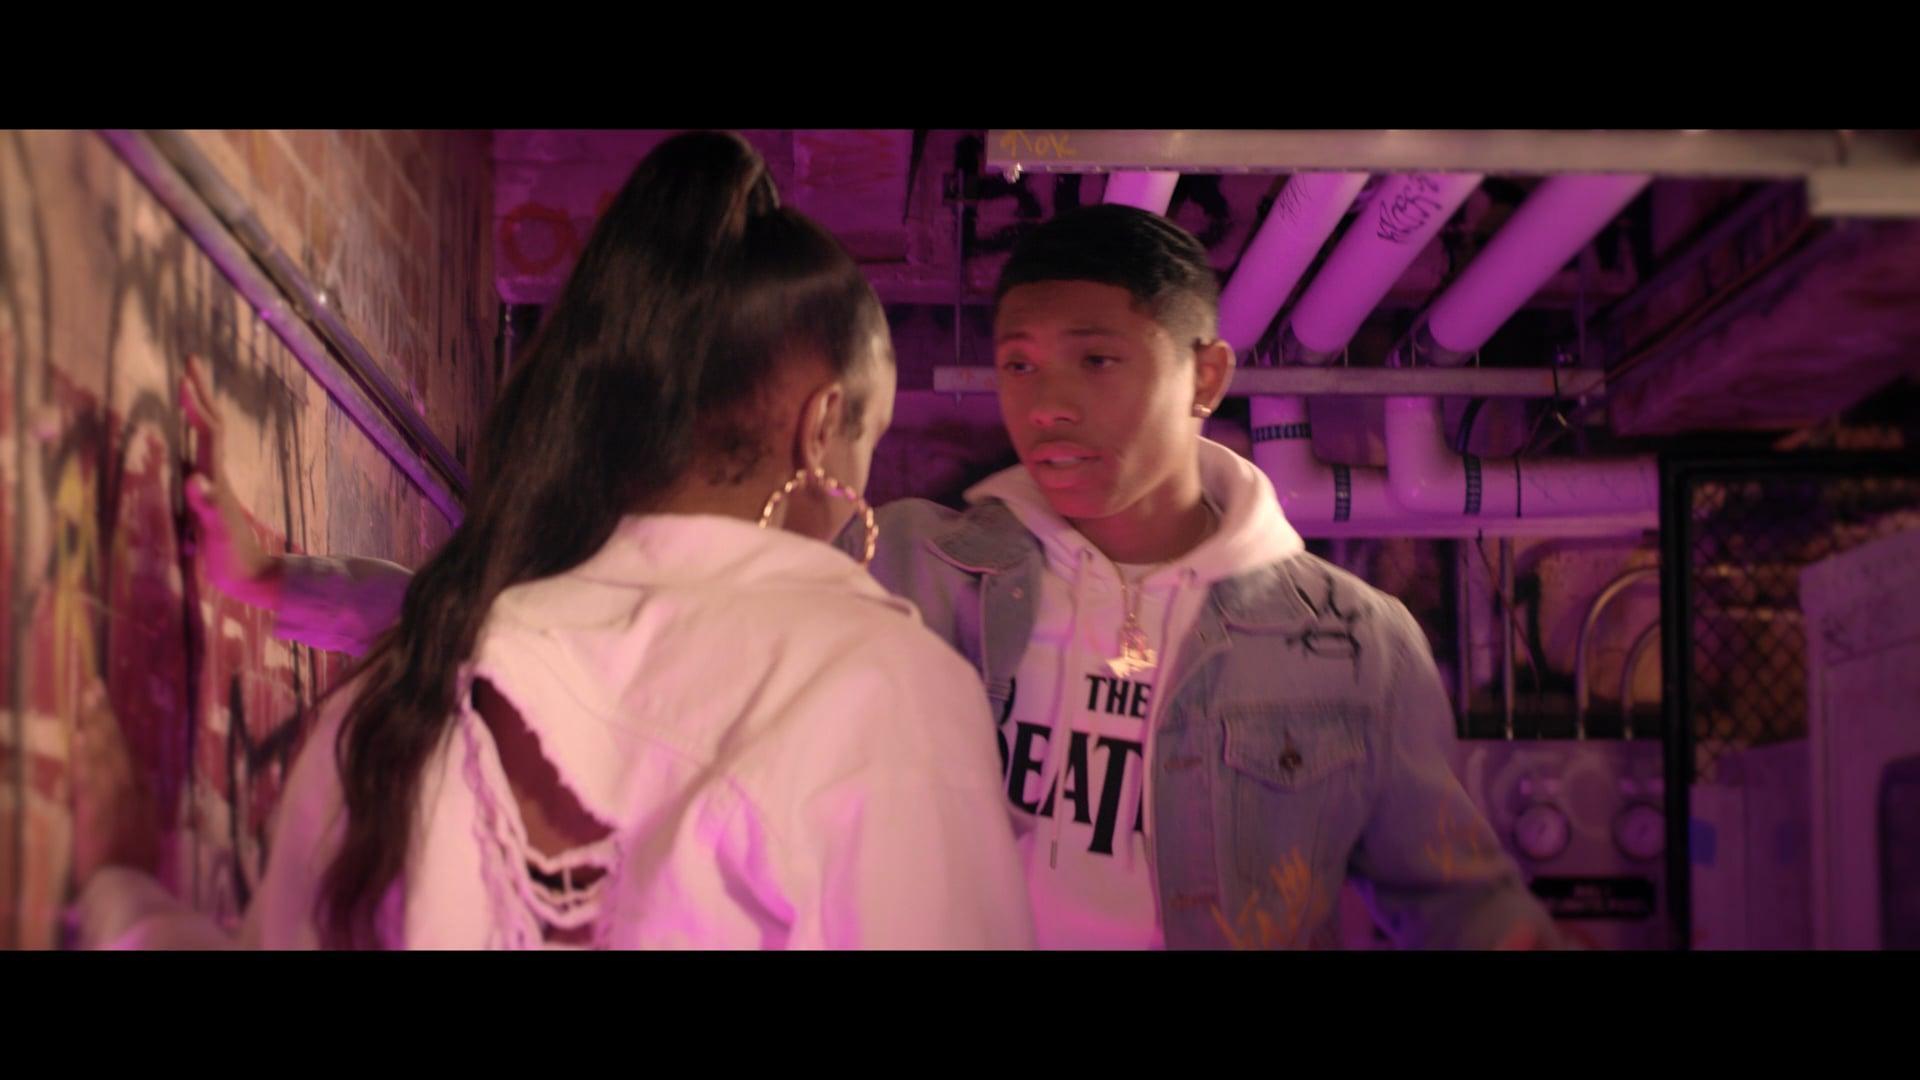 Chris Brown - Heat (Music Video) featuring Gunna